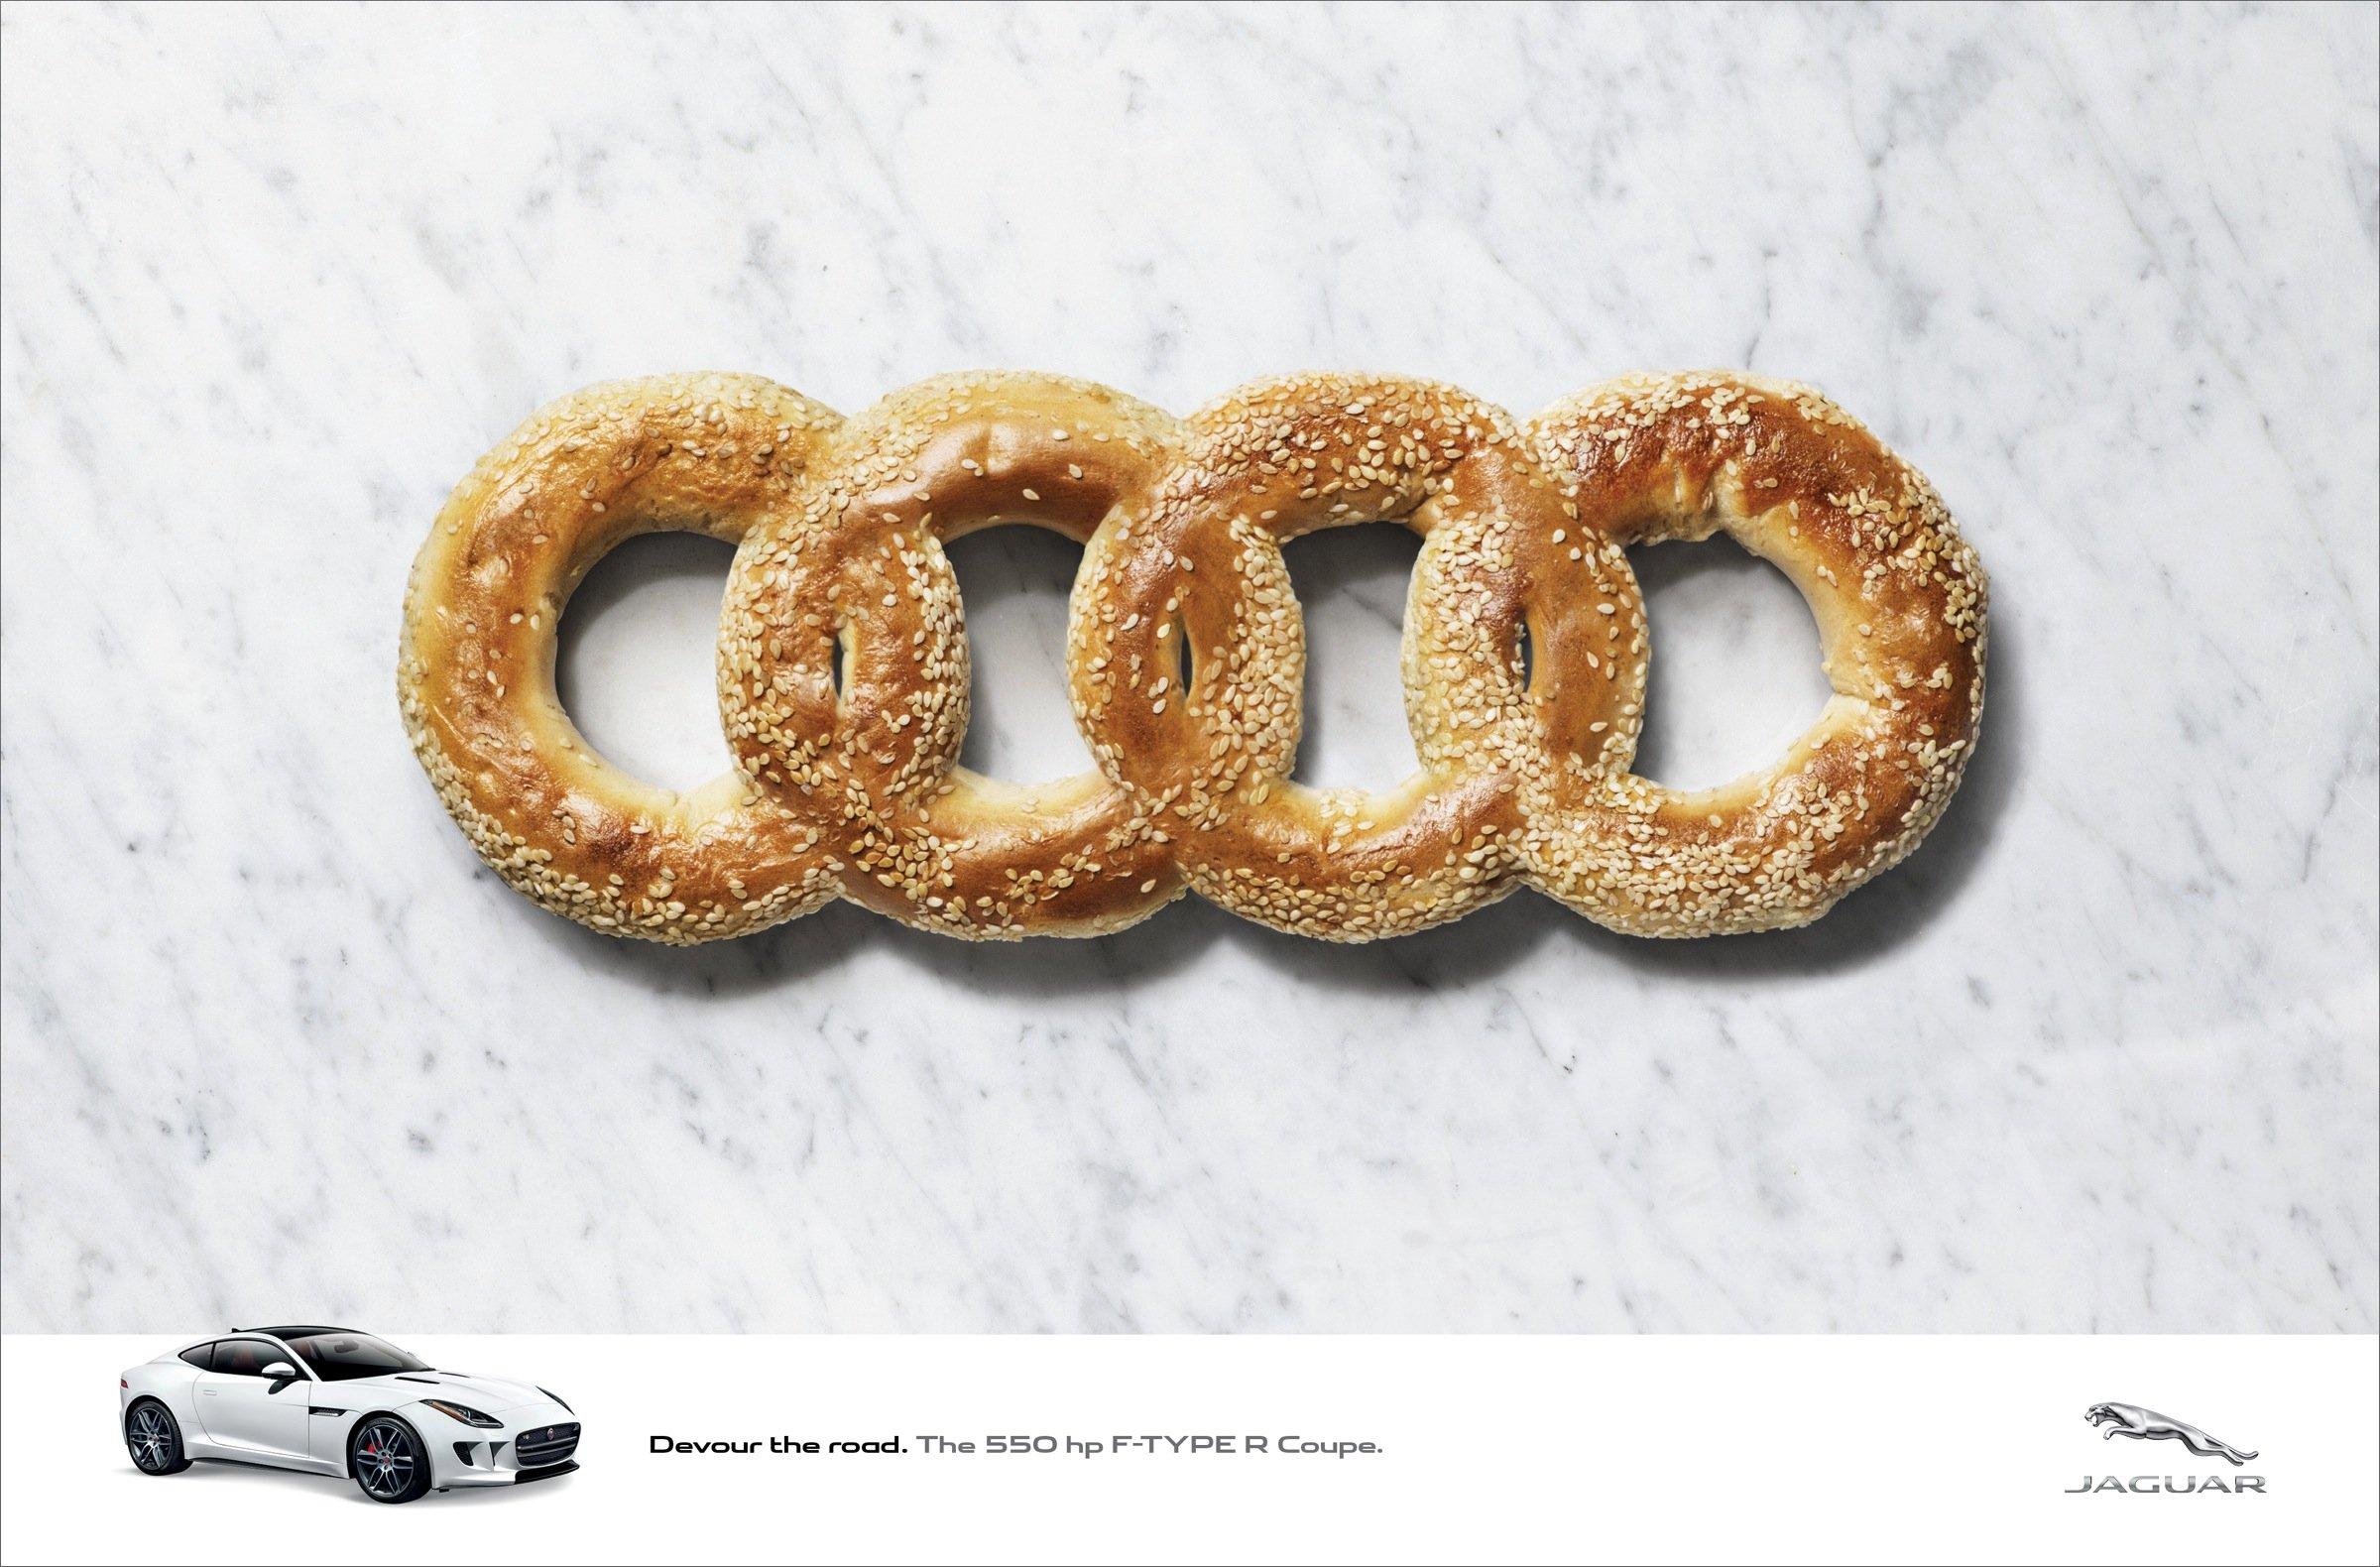 Jaguar Devours German Rivals Logos With Creative Print Ads